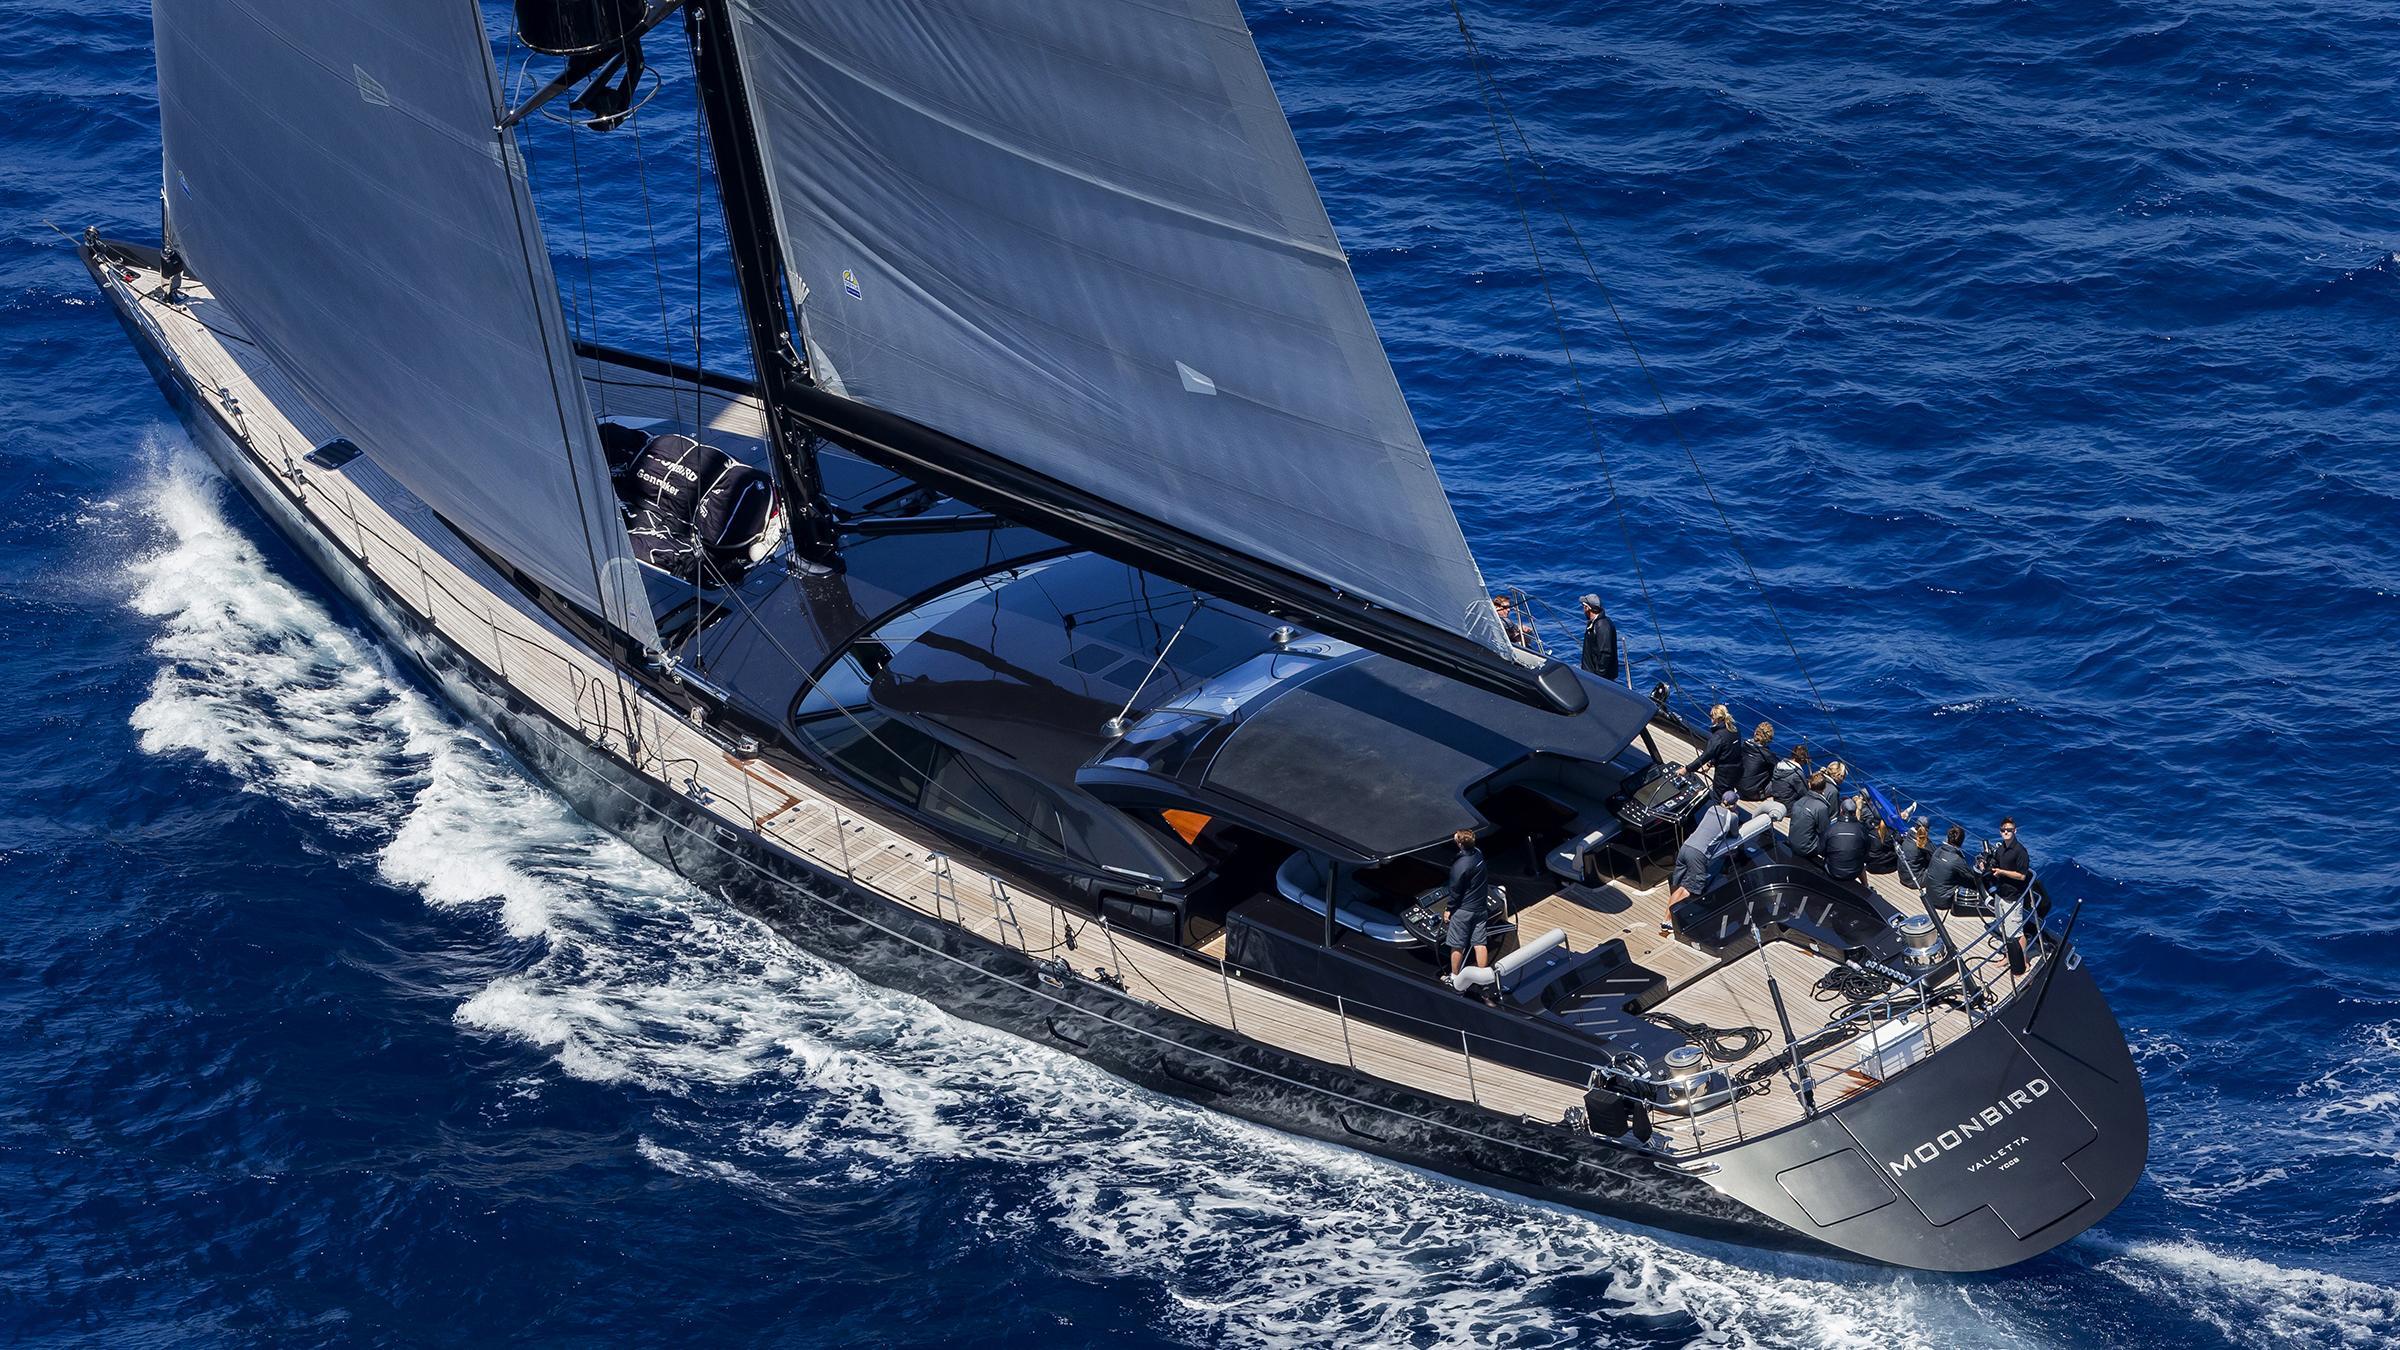 moonbird-yacht-racing